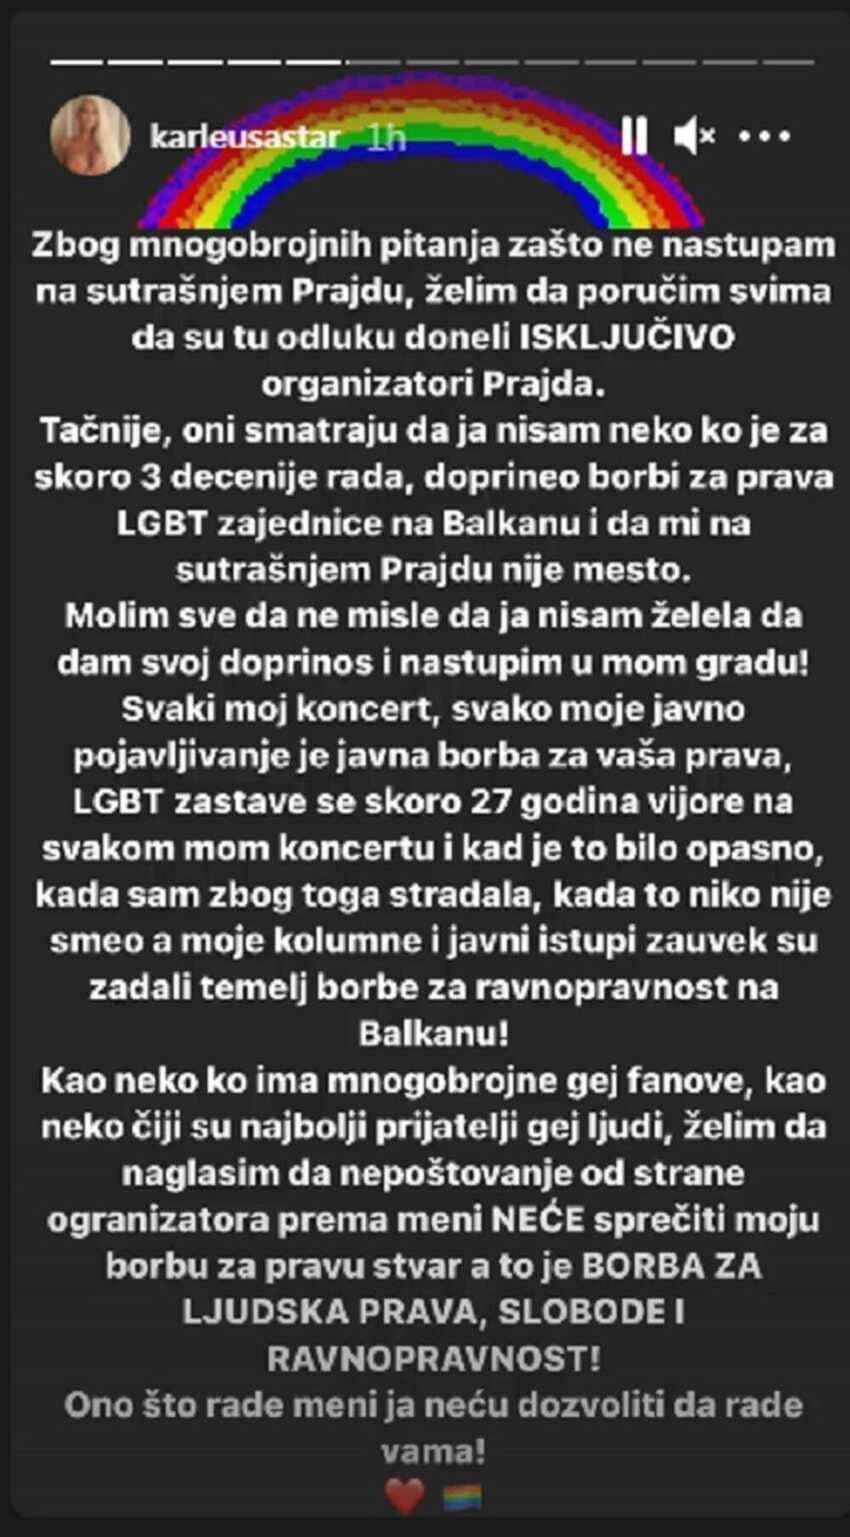 karleusa-stori-gej-ikona